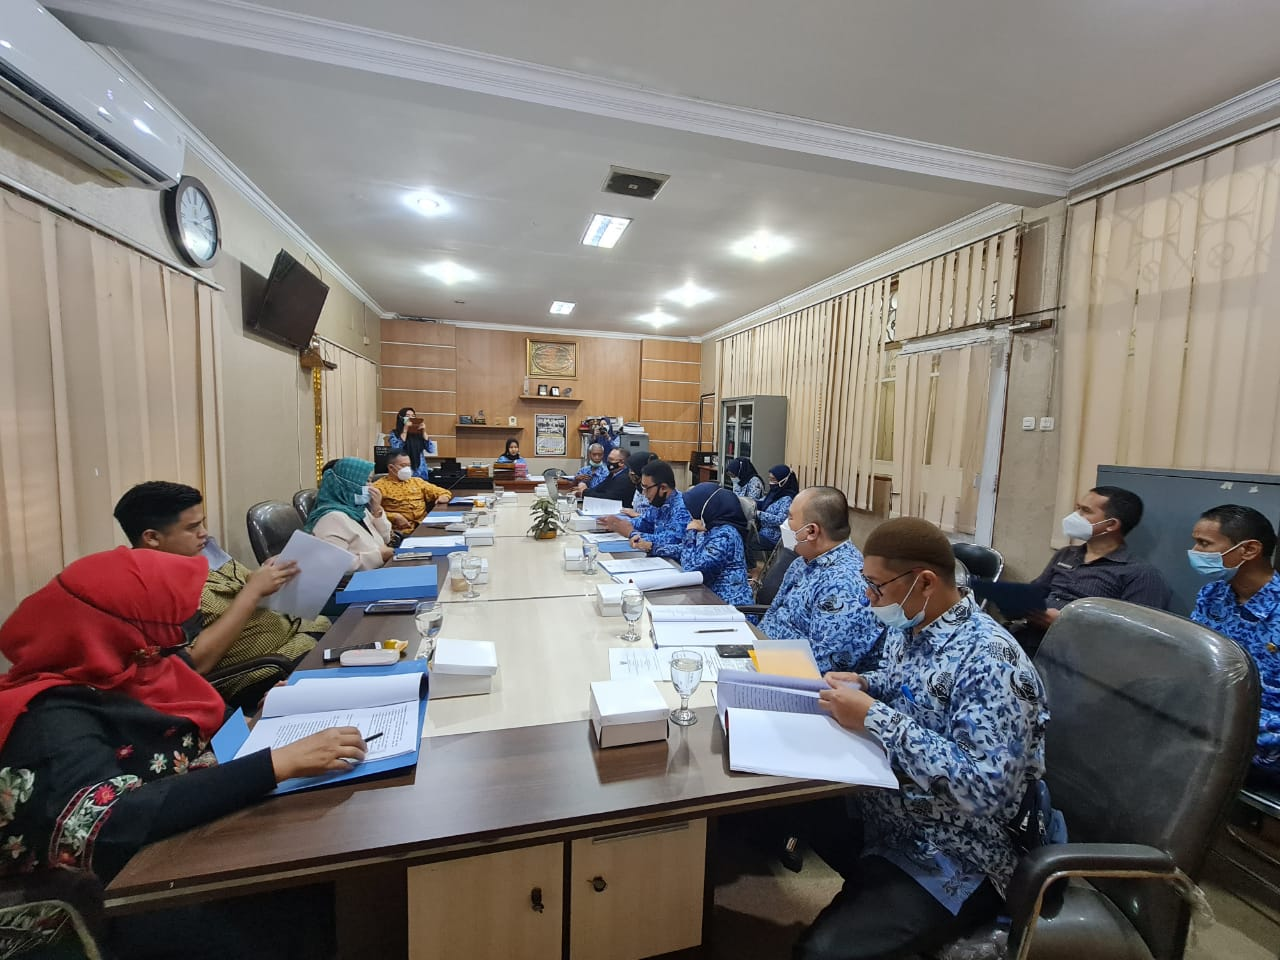 Rabu, 17 Februari 2021 Pembahasan Draf Raperda Penyelenggaraan Perlindungan Perempuan dan Anak bersama DPRD Komisi C